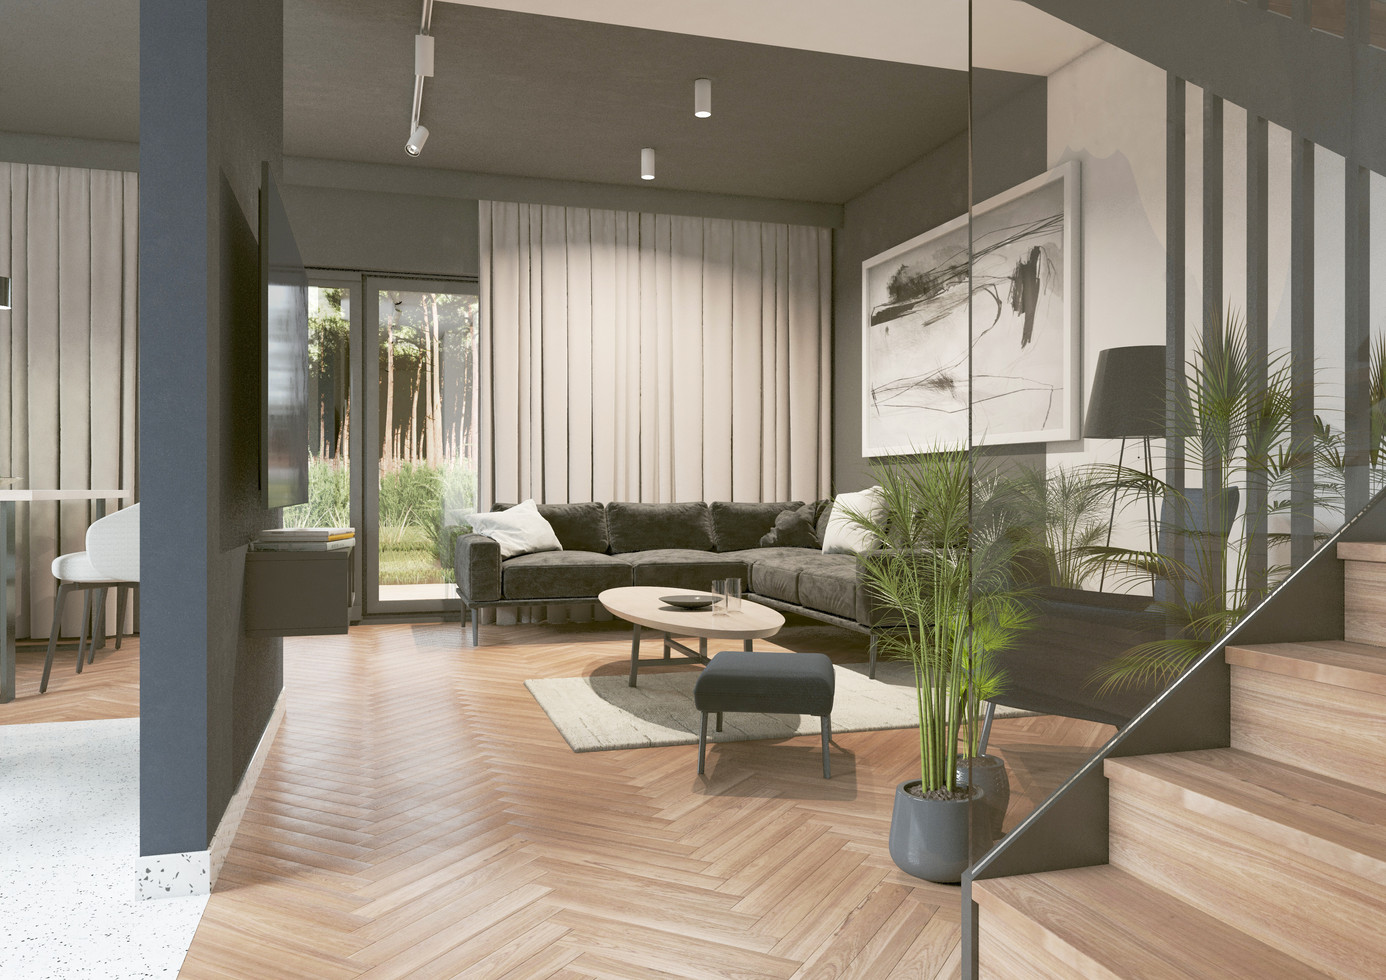 Wnętrze - salon I